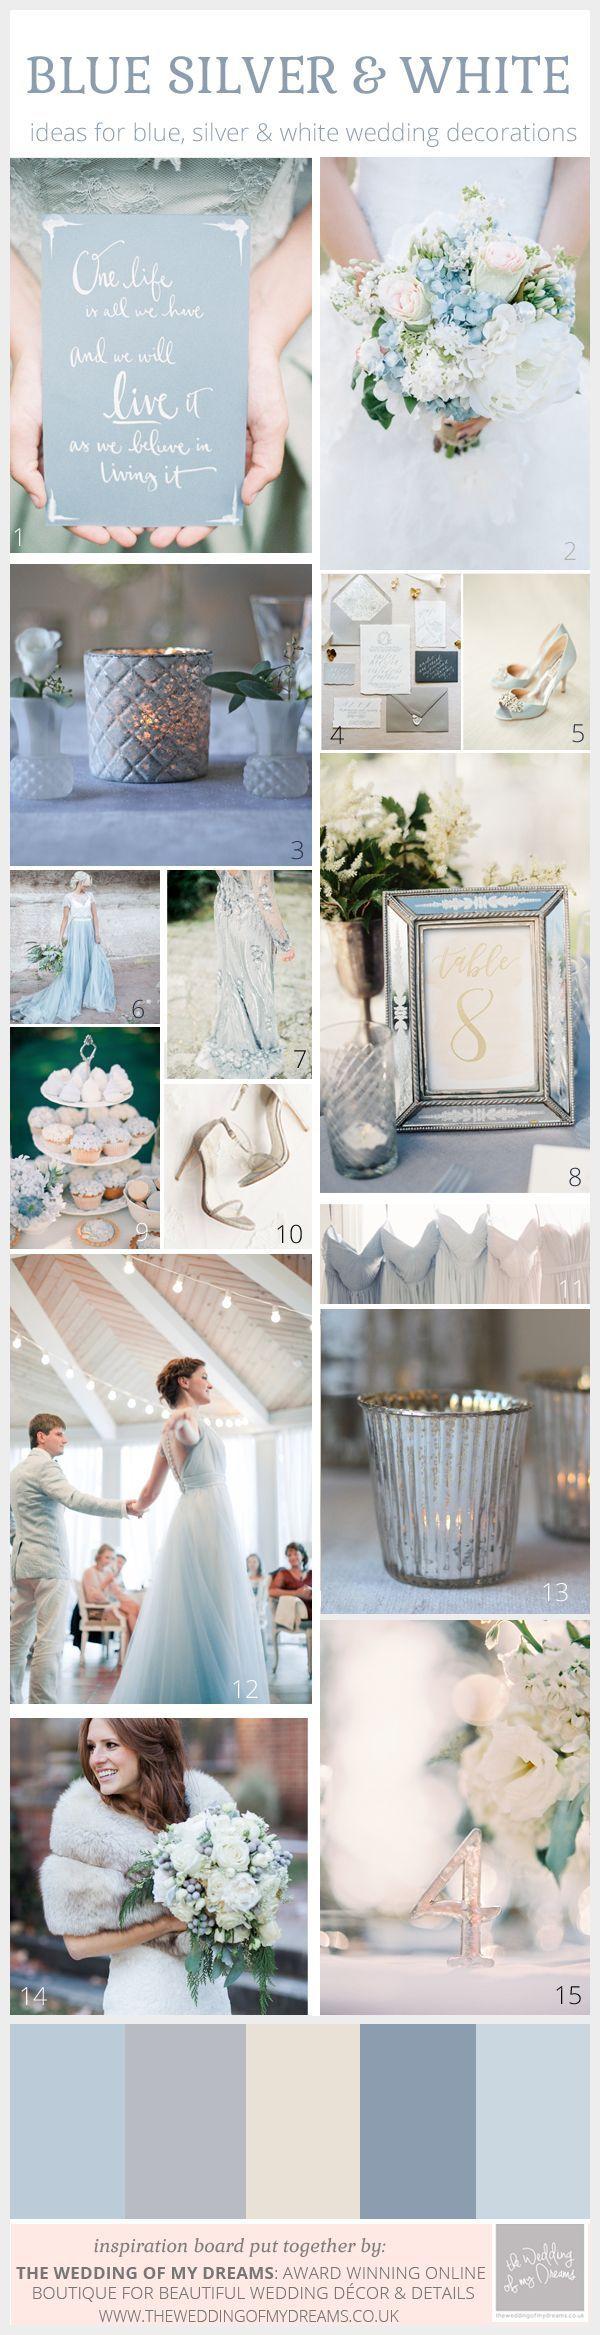 58 best Winter Wedding images on Pinterest | Wedding decoration ...